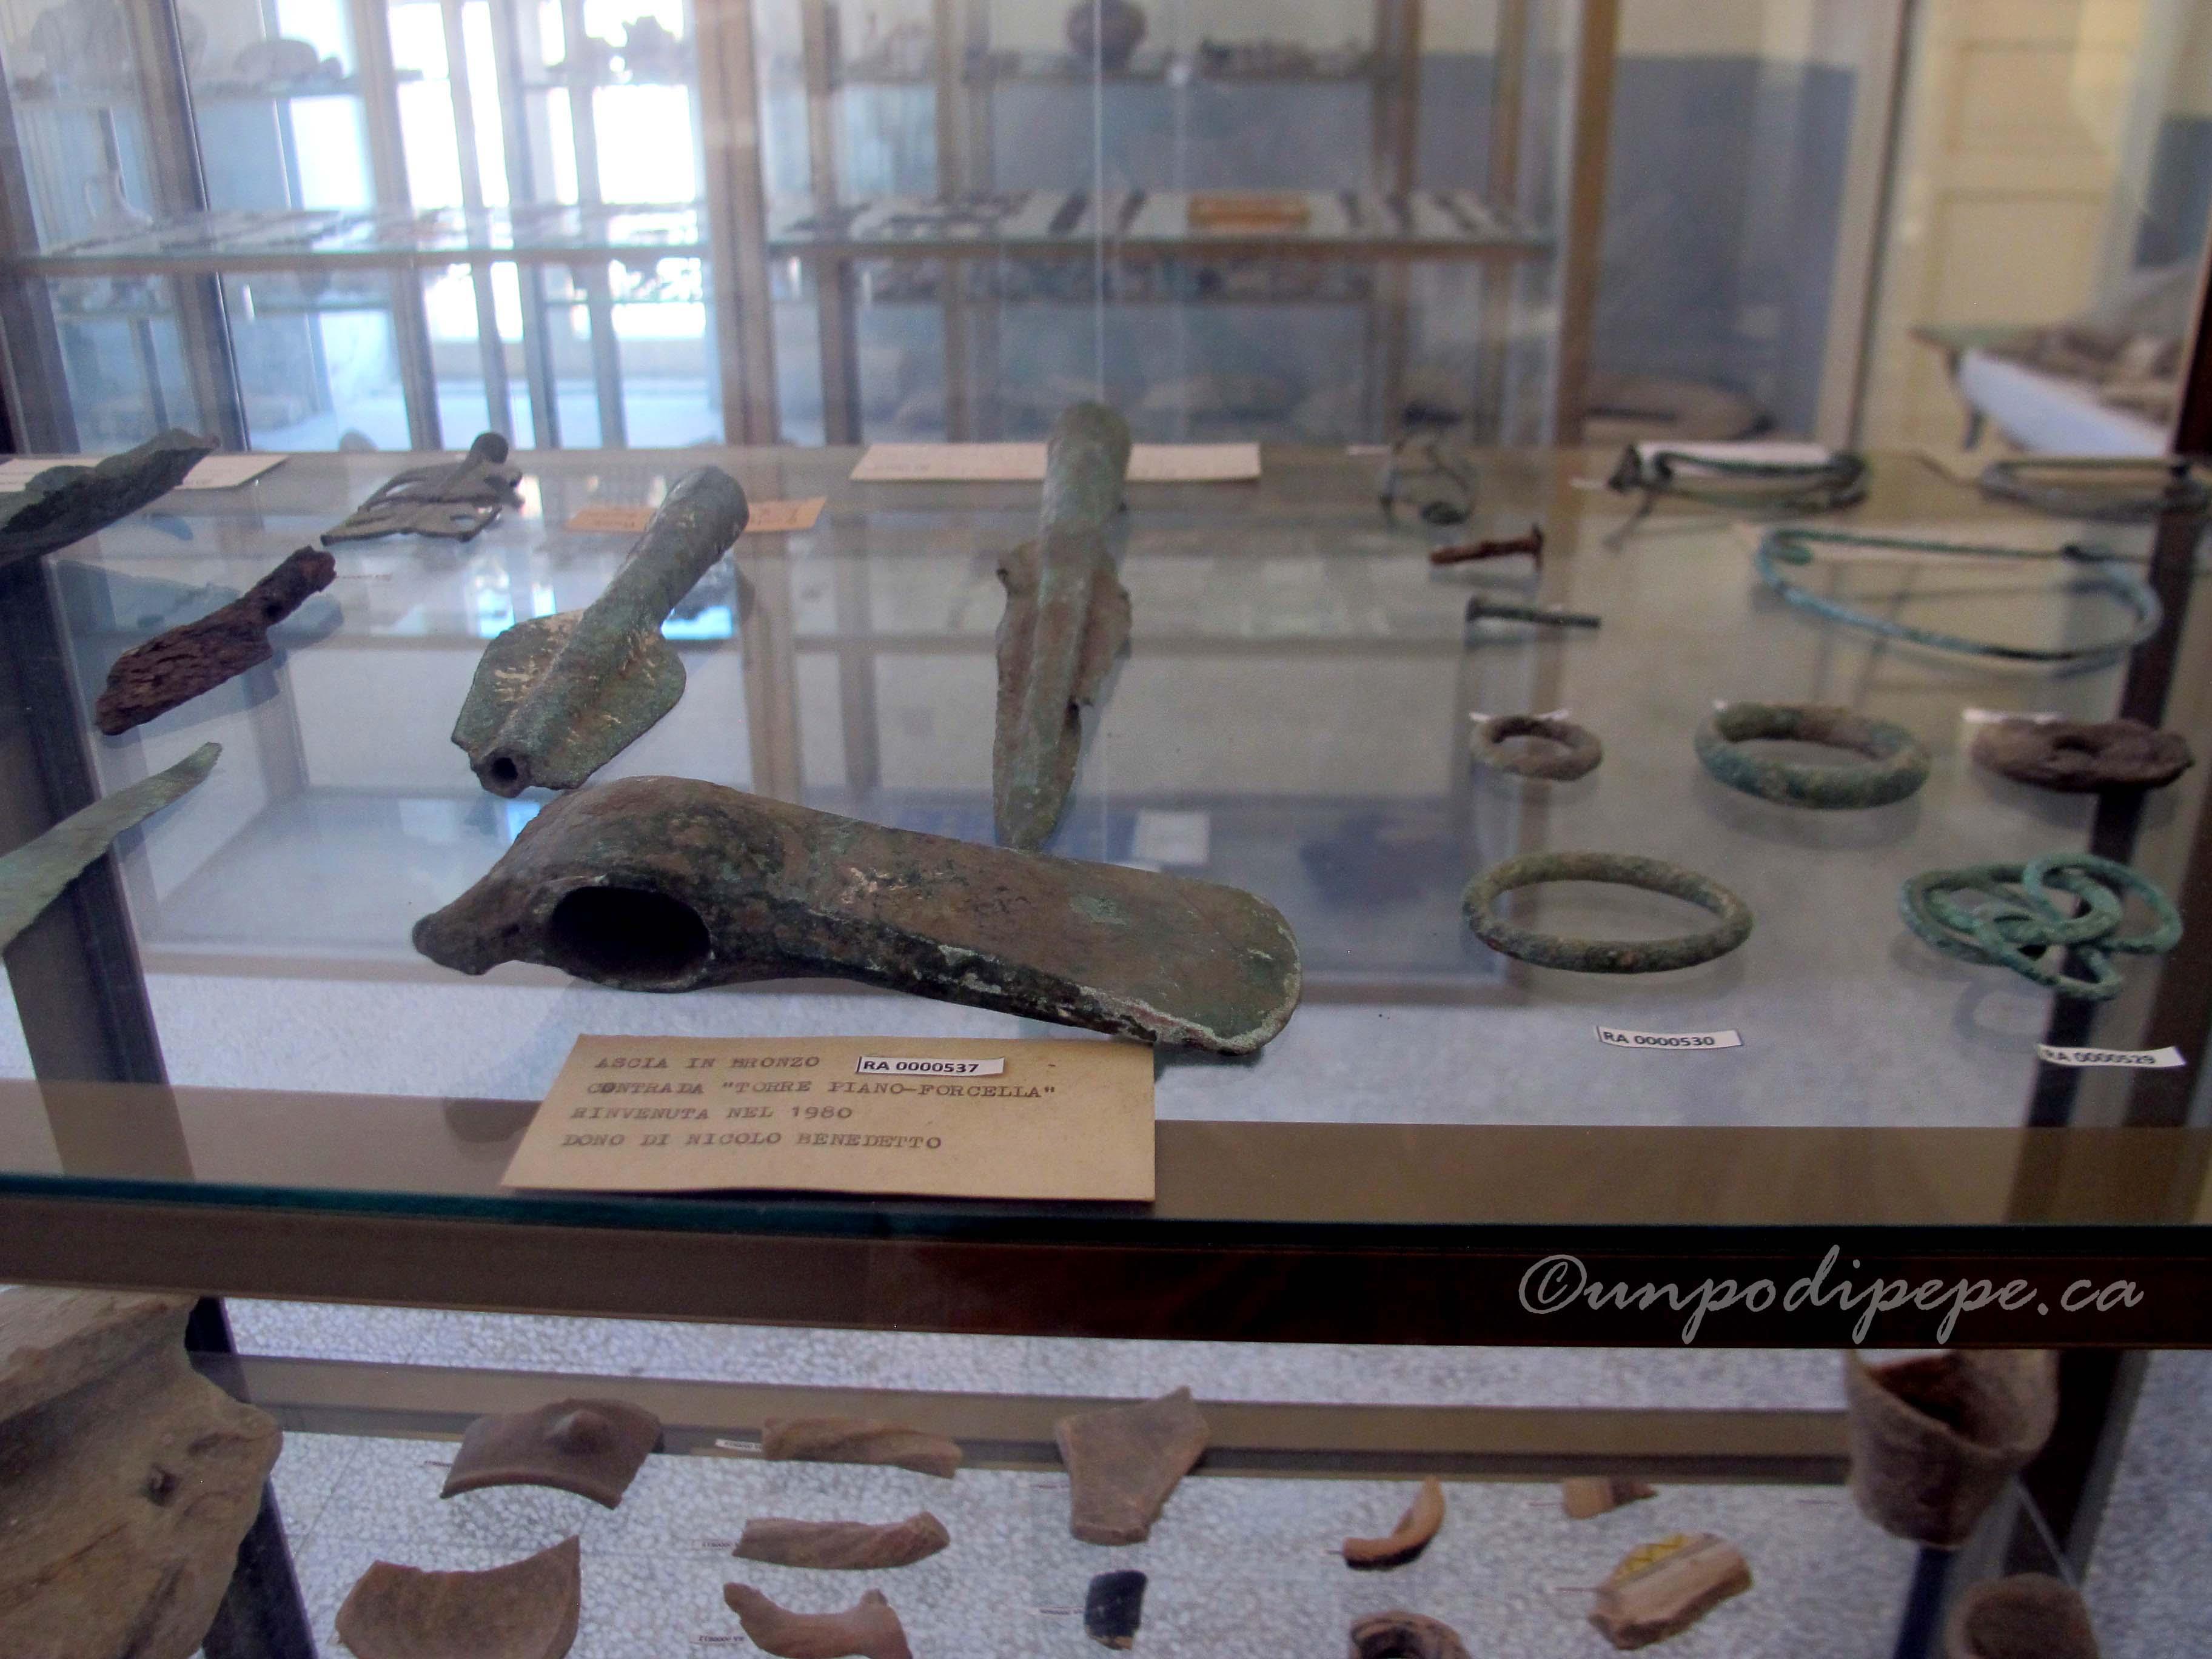 Ascia e lancie in Bronzo (bronze hatchet and spears)